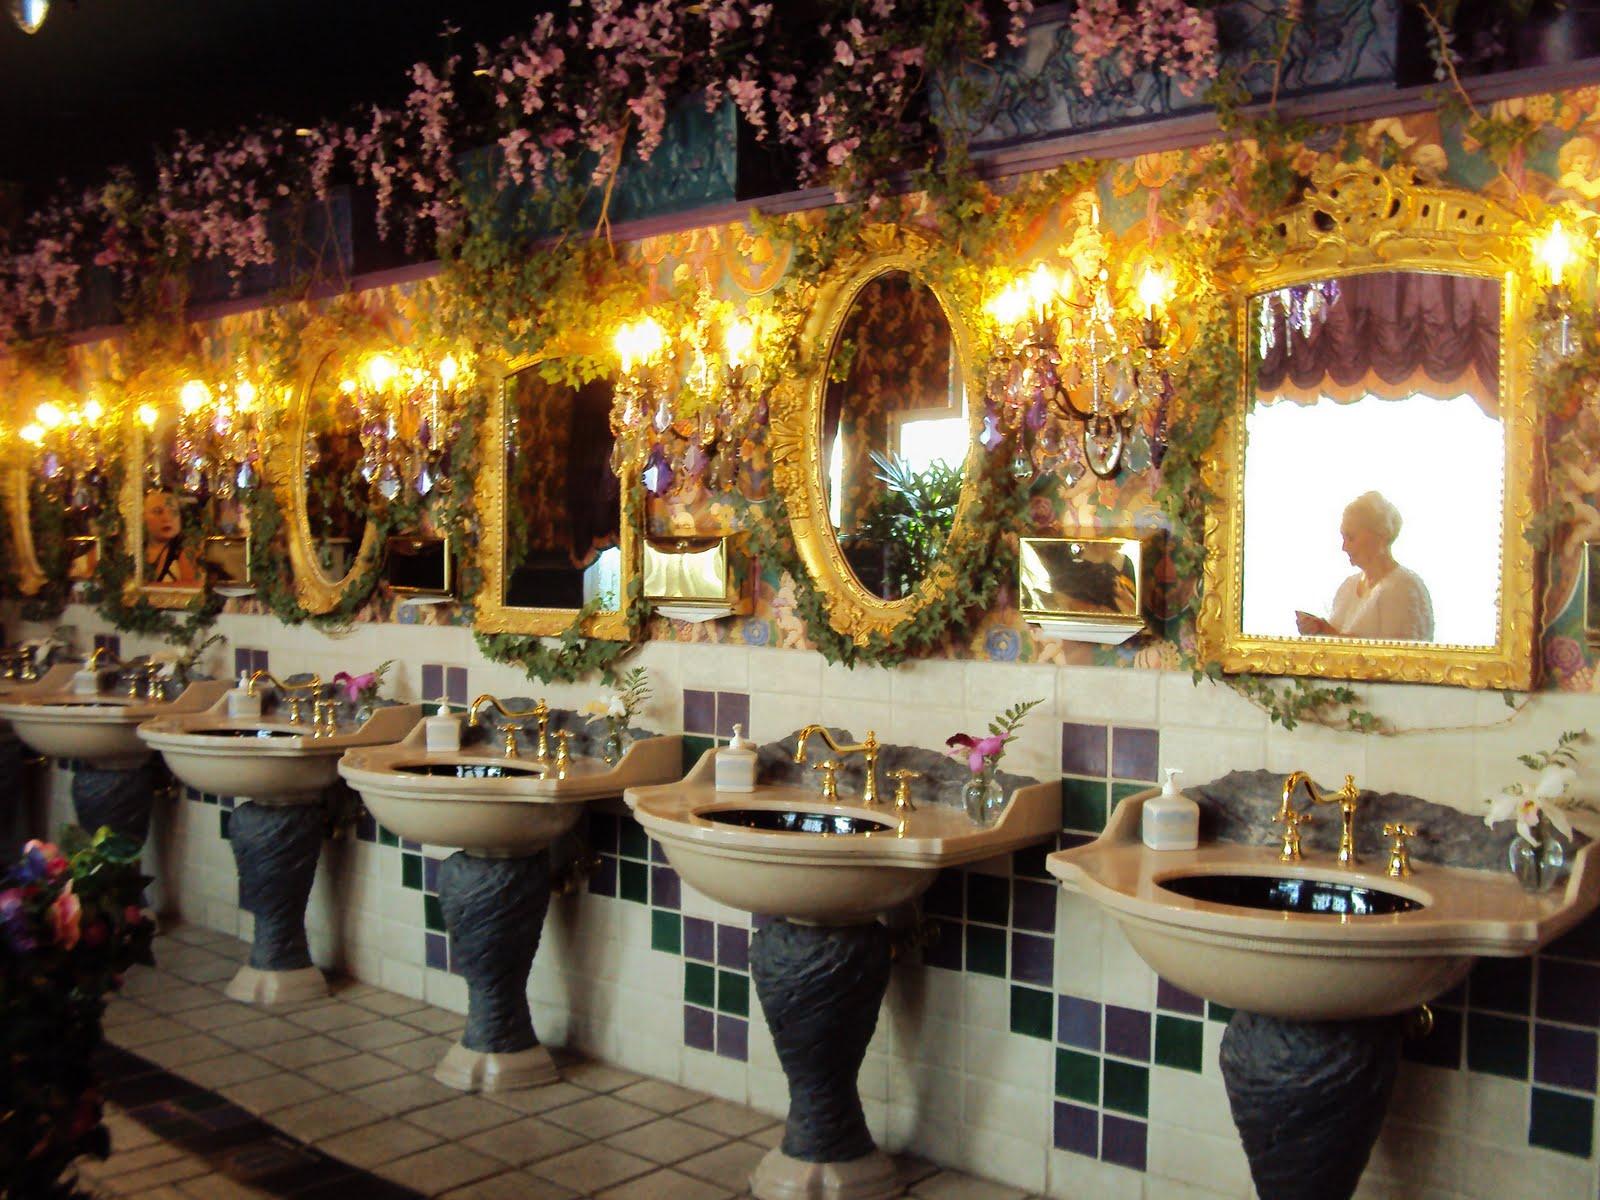 Shoji Tabuchi's Famed Restrooms